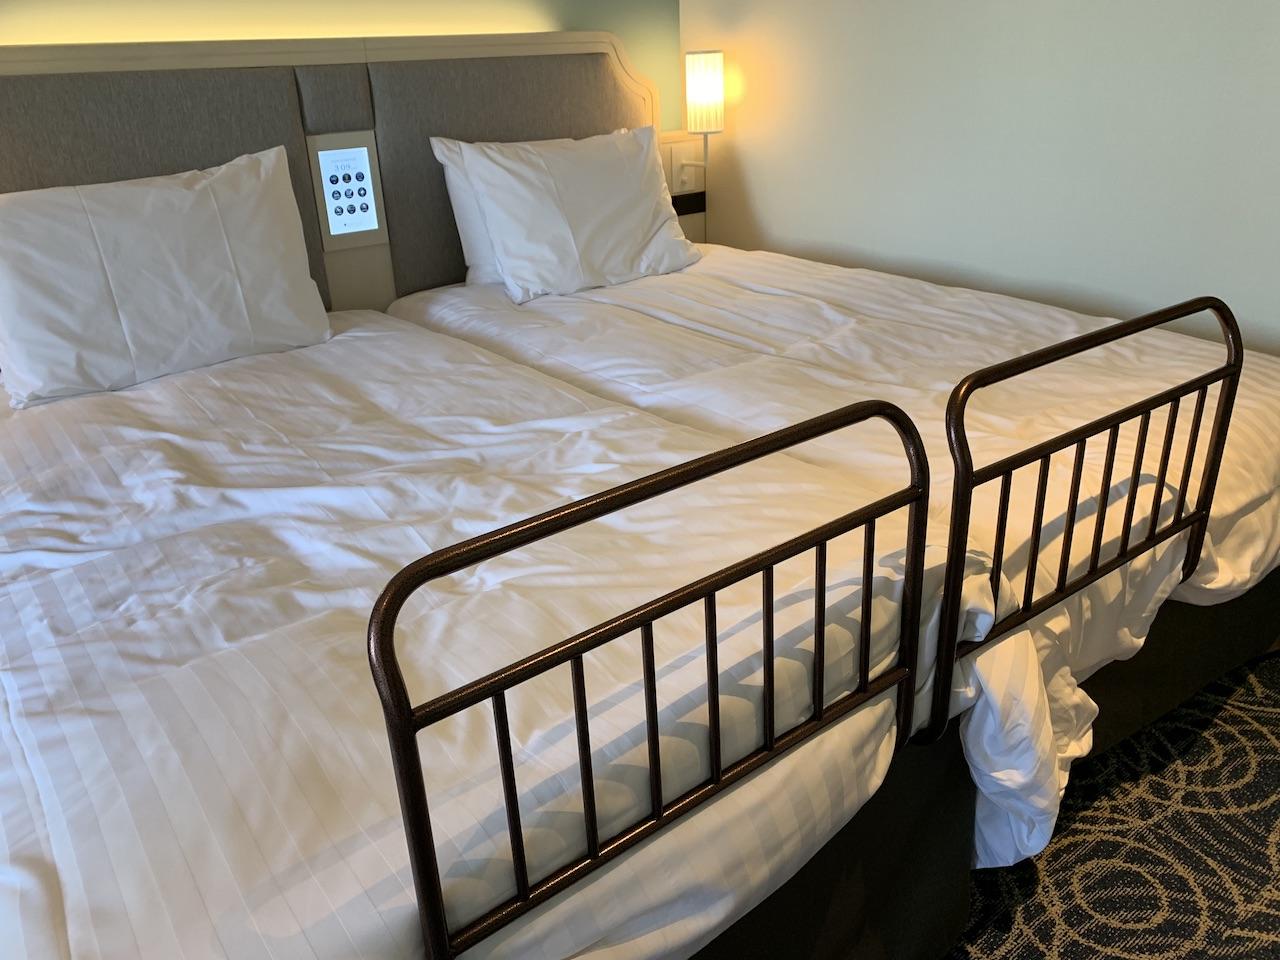 liber-hotel-usj-room-19